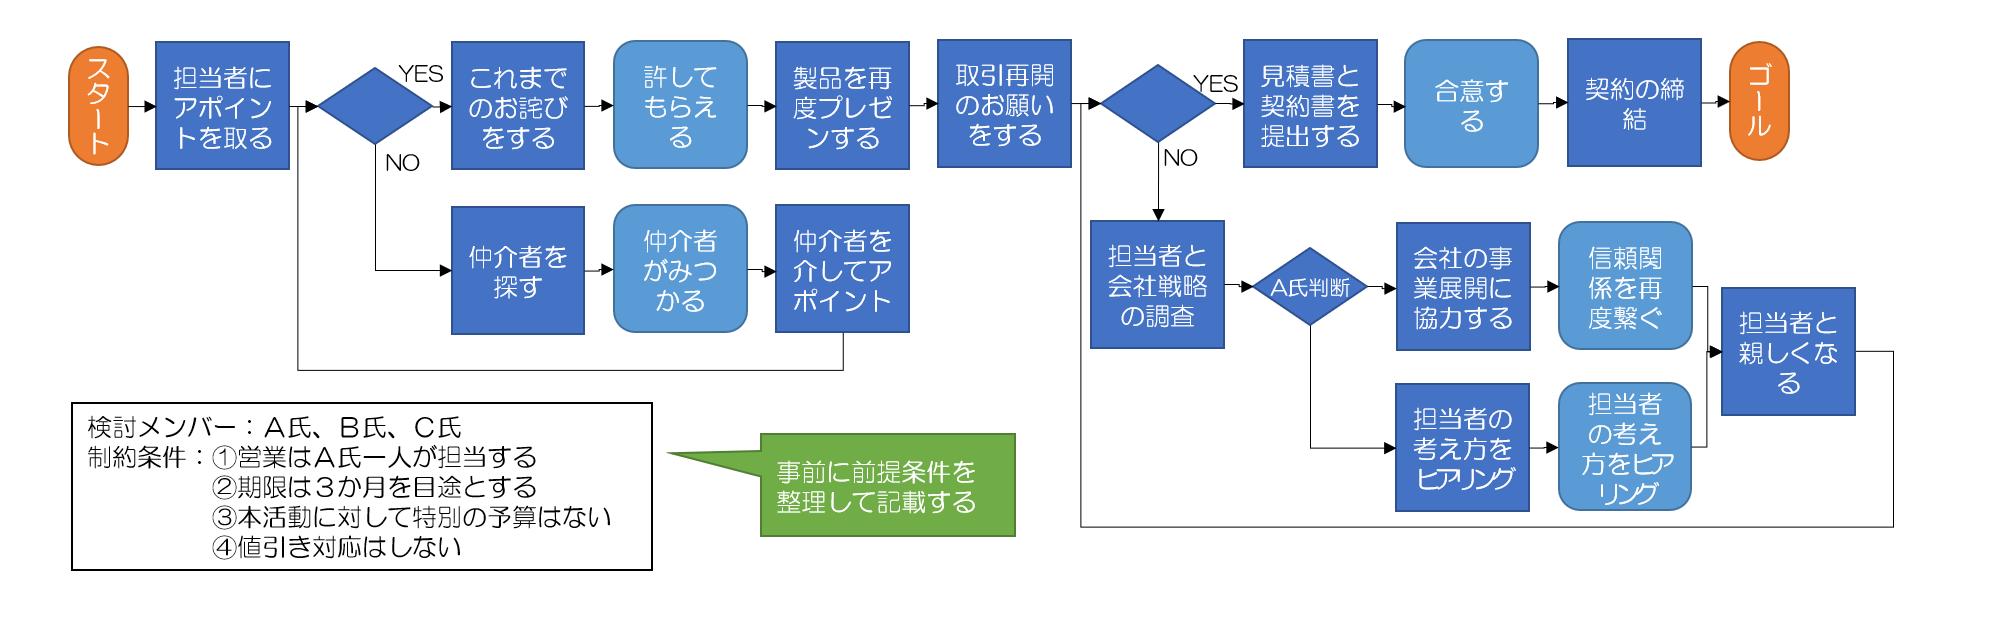 PDPC法の事例